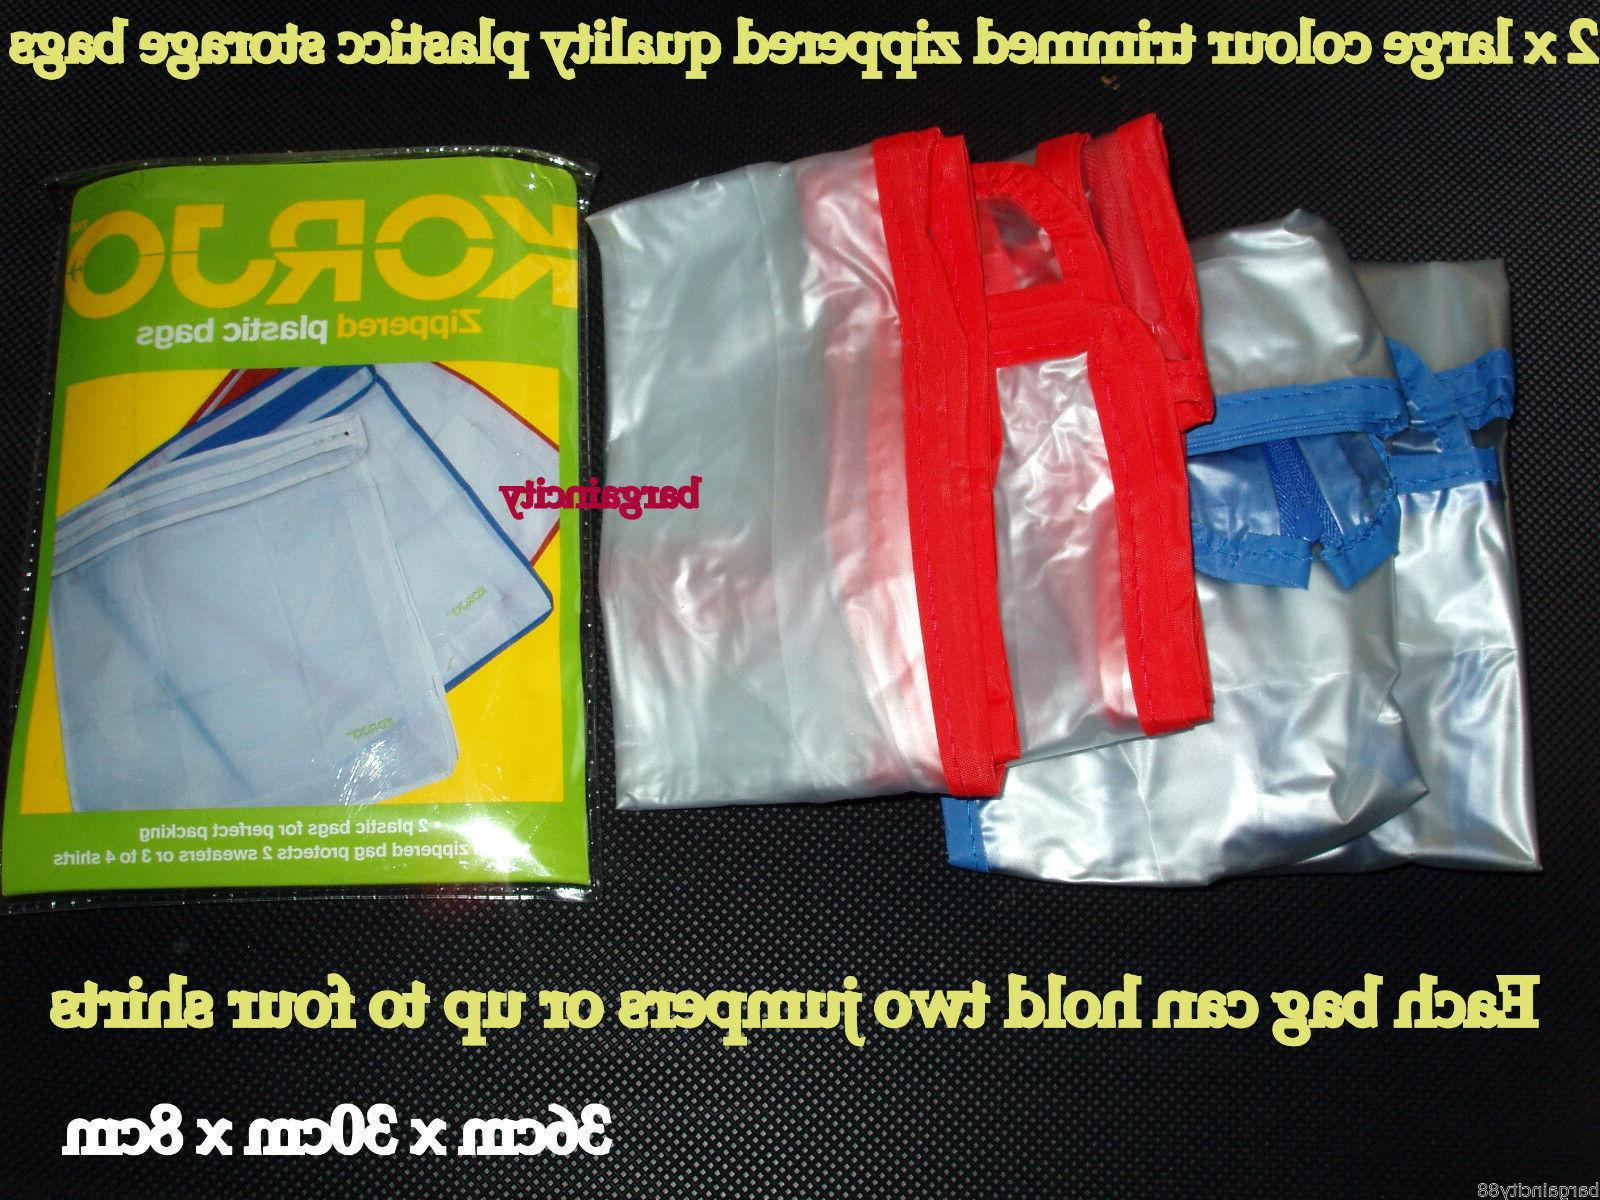 Korjo ZPB23 Zipped Packing Luggage Clothes Shoe Storage